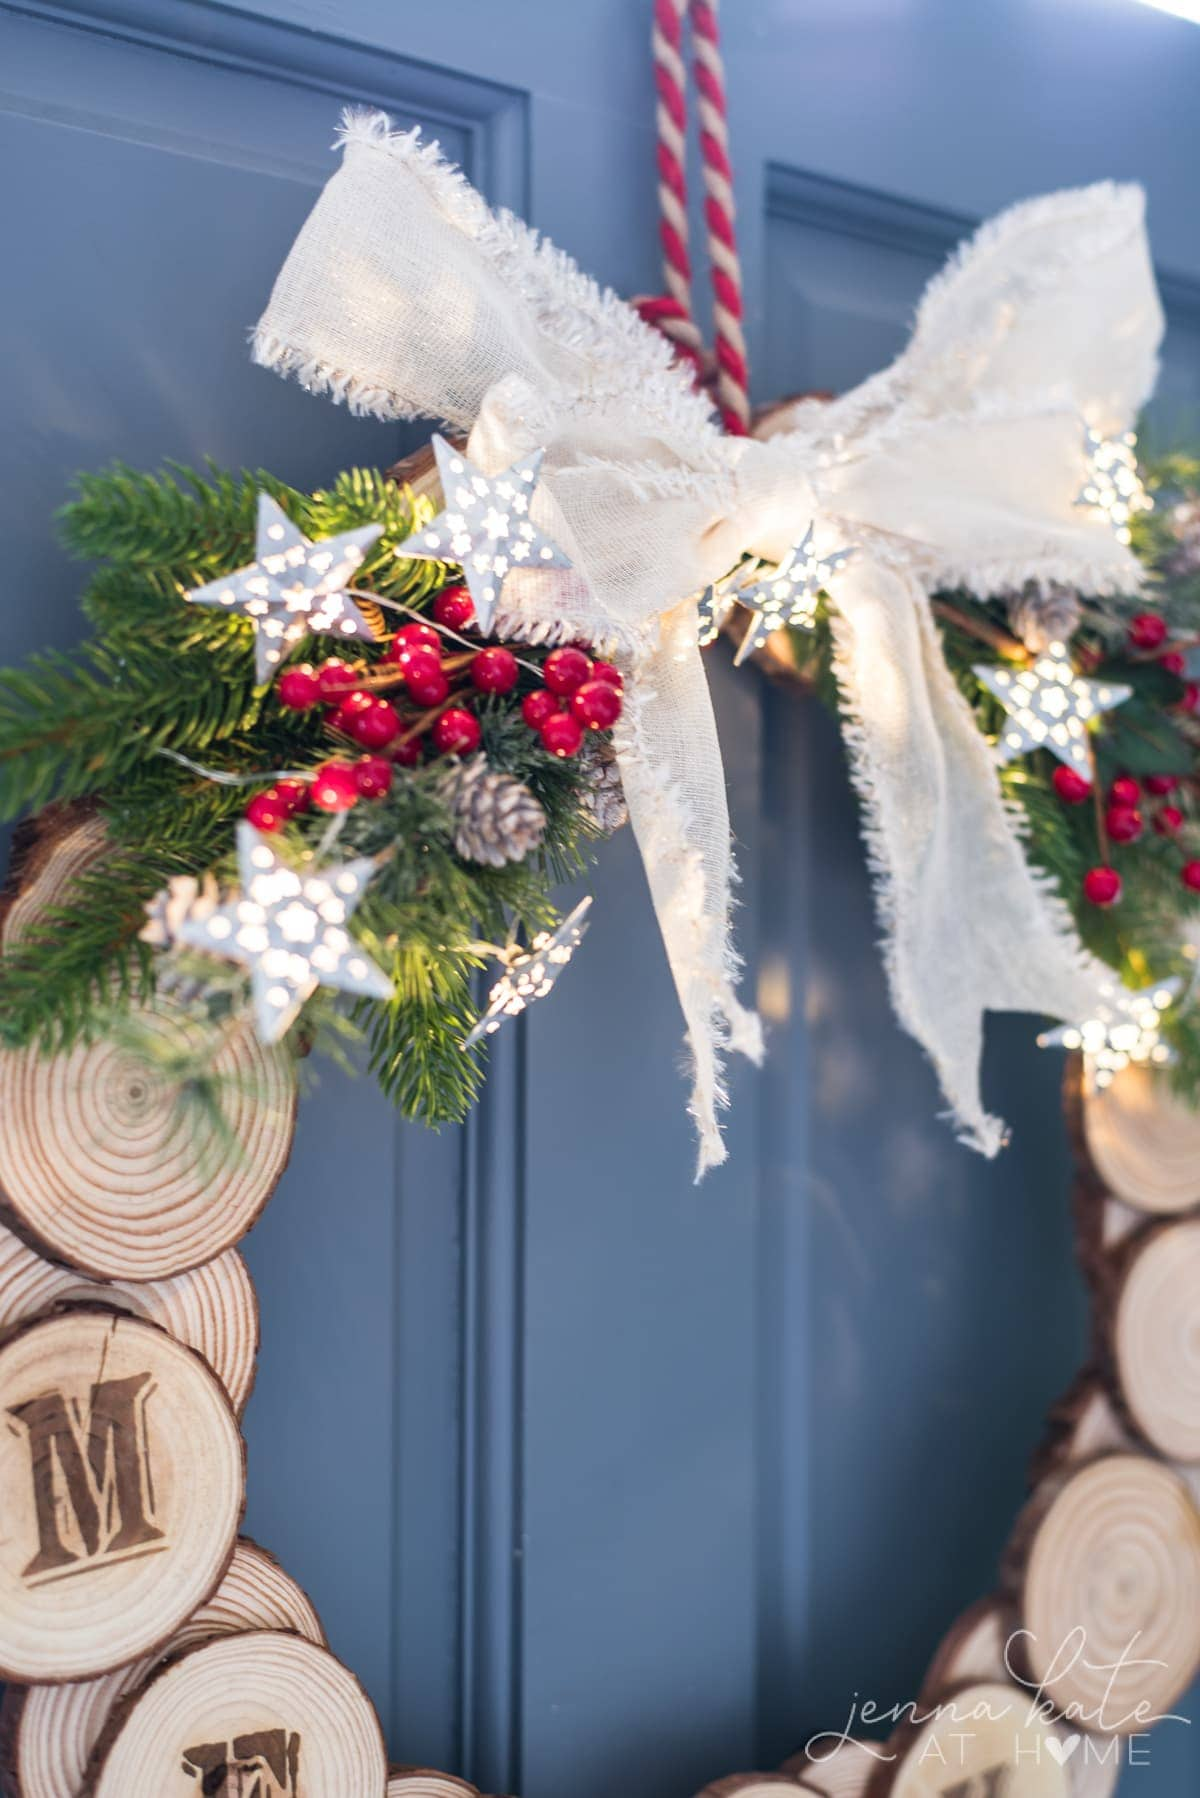 DIY Wood slice Christmas wreath